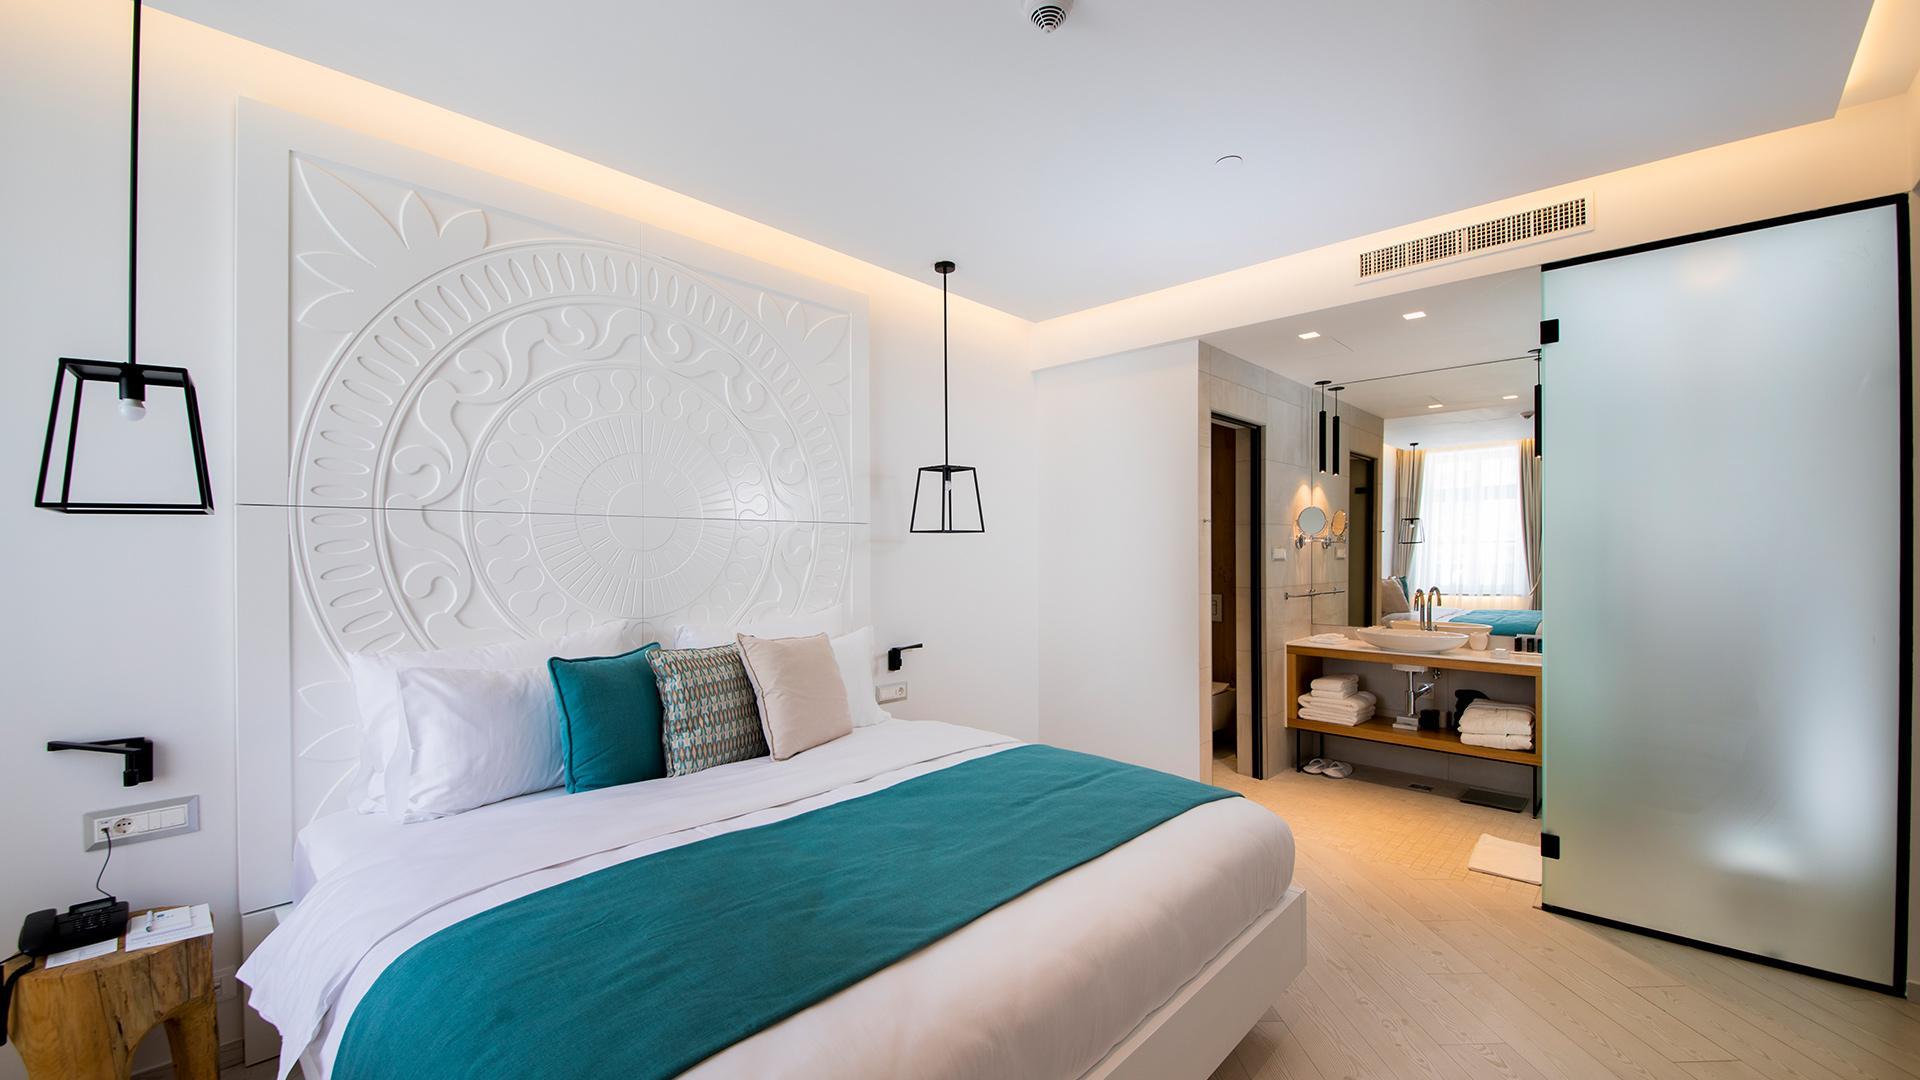 Sea View Suite image 1 at Lazure Marina & Hotel by null, Herceg Novi Municipality, Montenegro